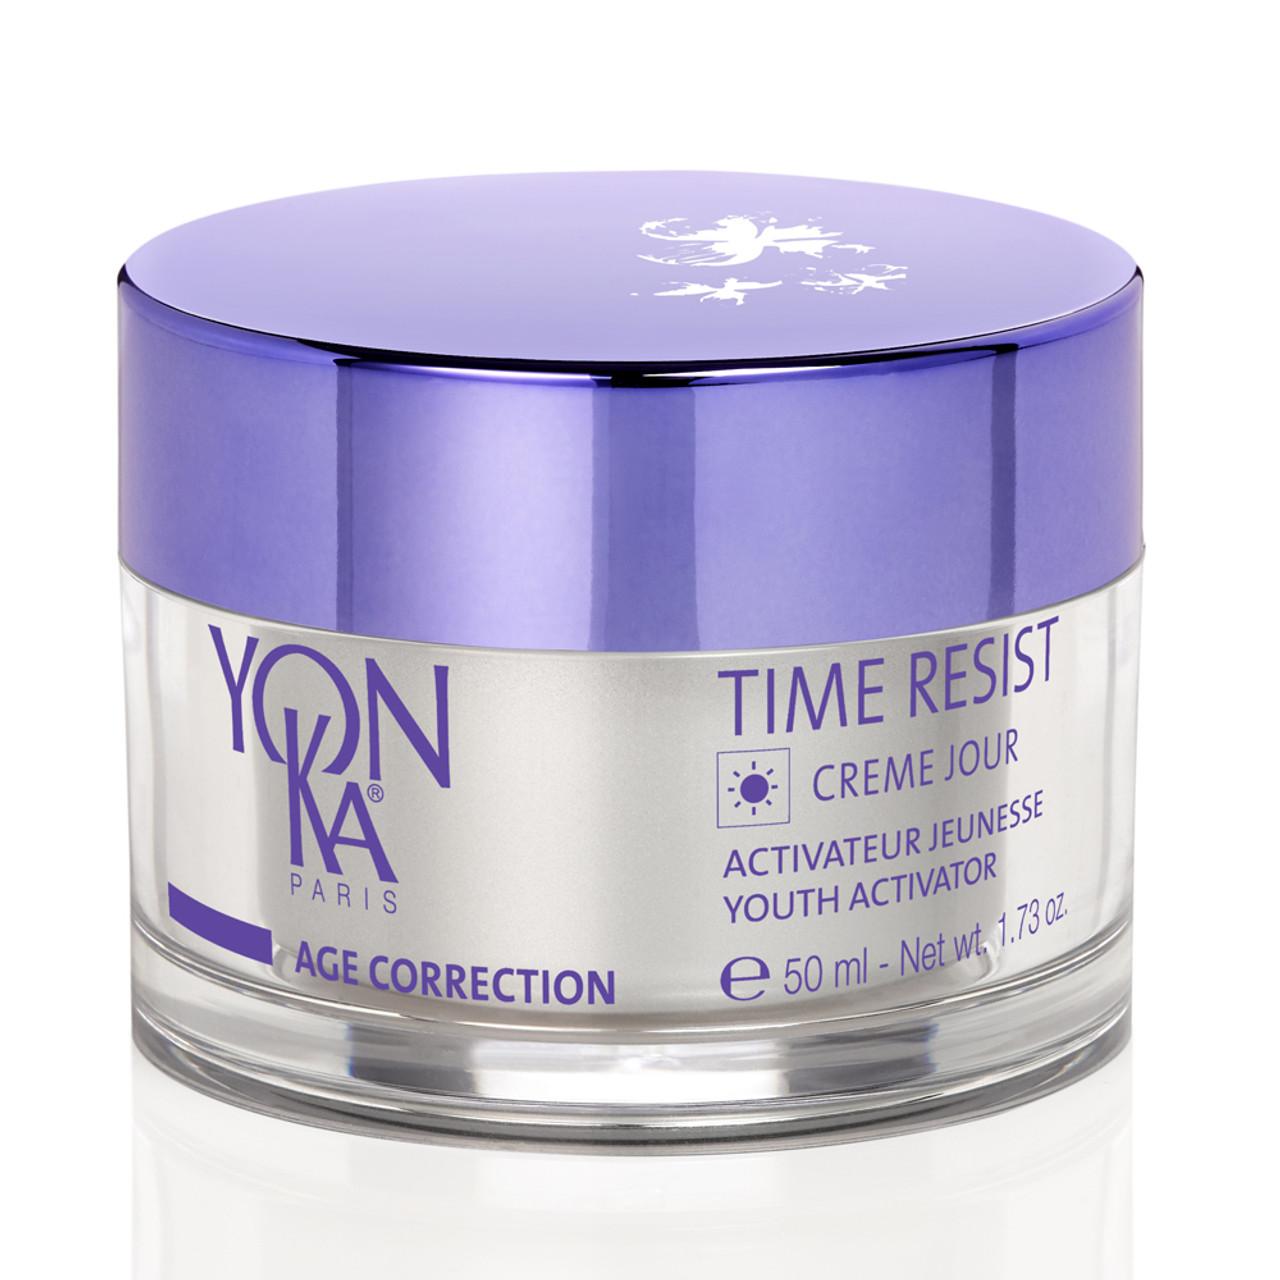 YonKa Time Resist Creme Jour BeautifiedYou.com